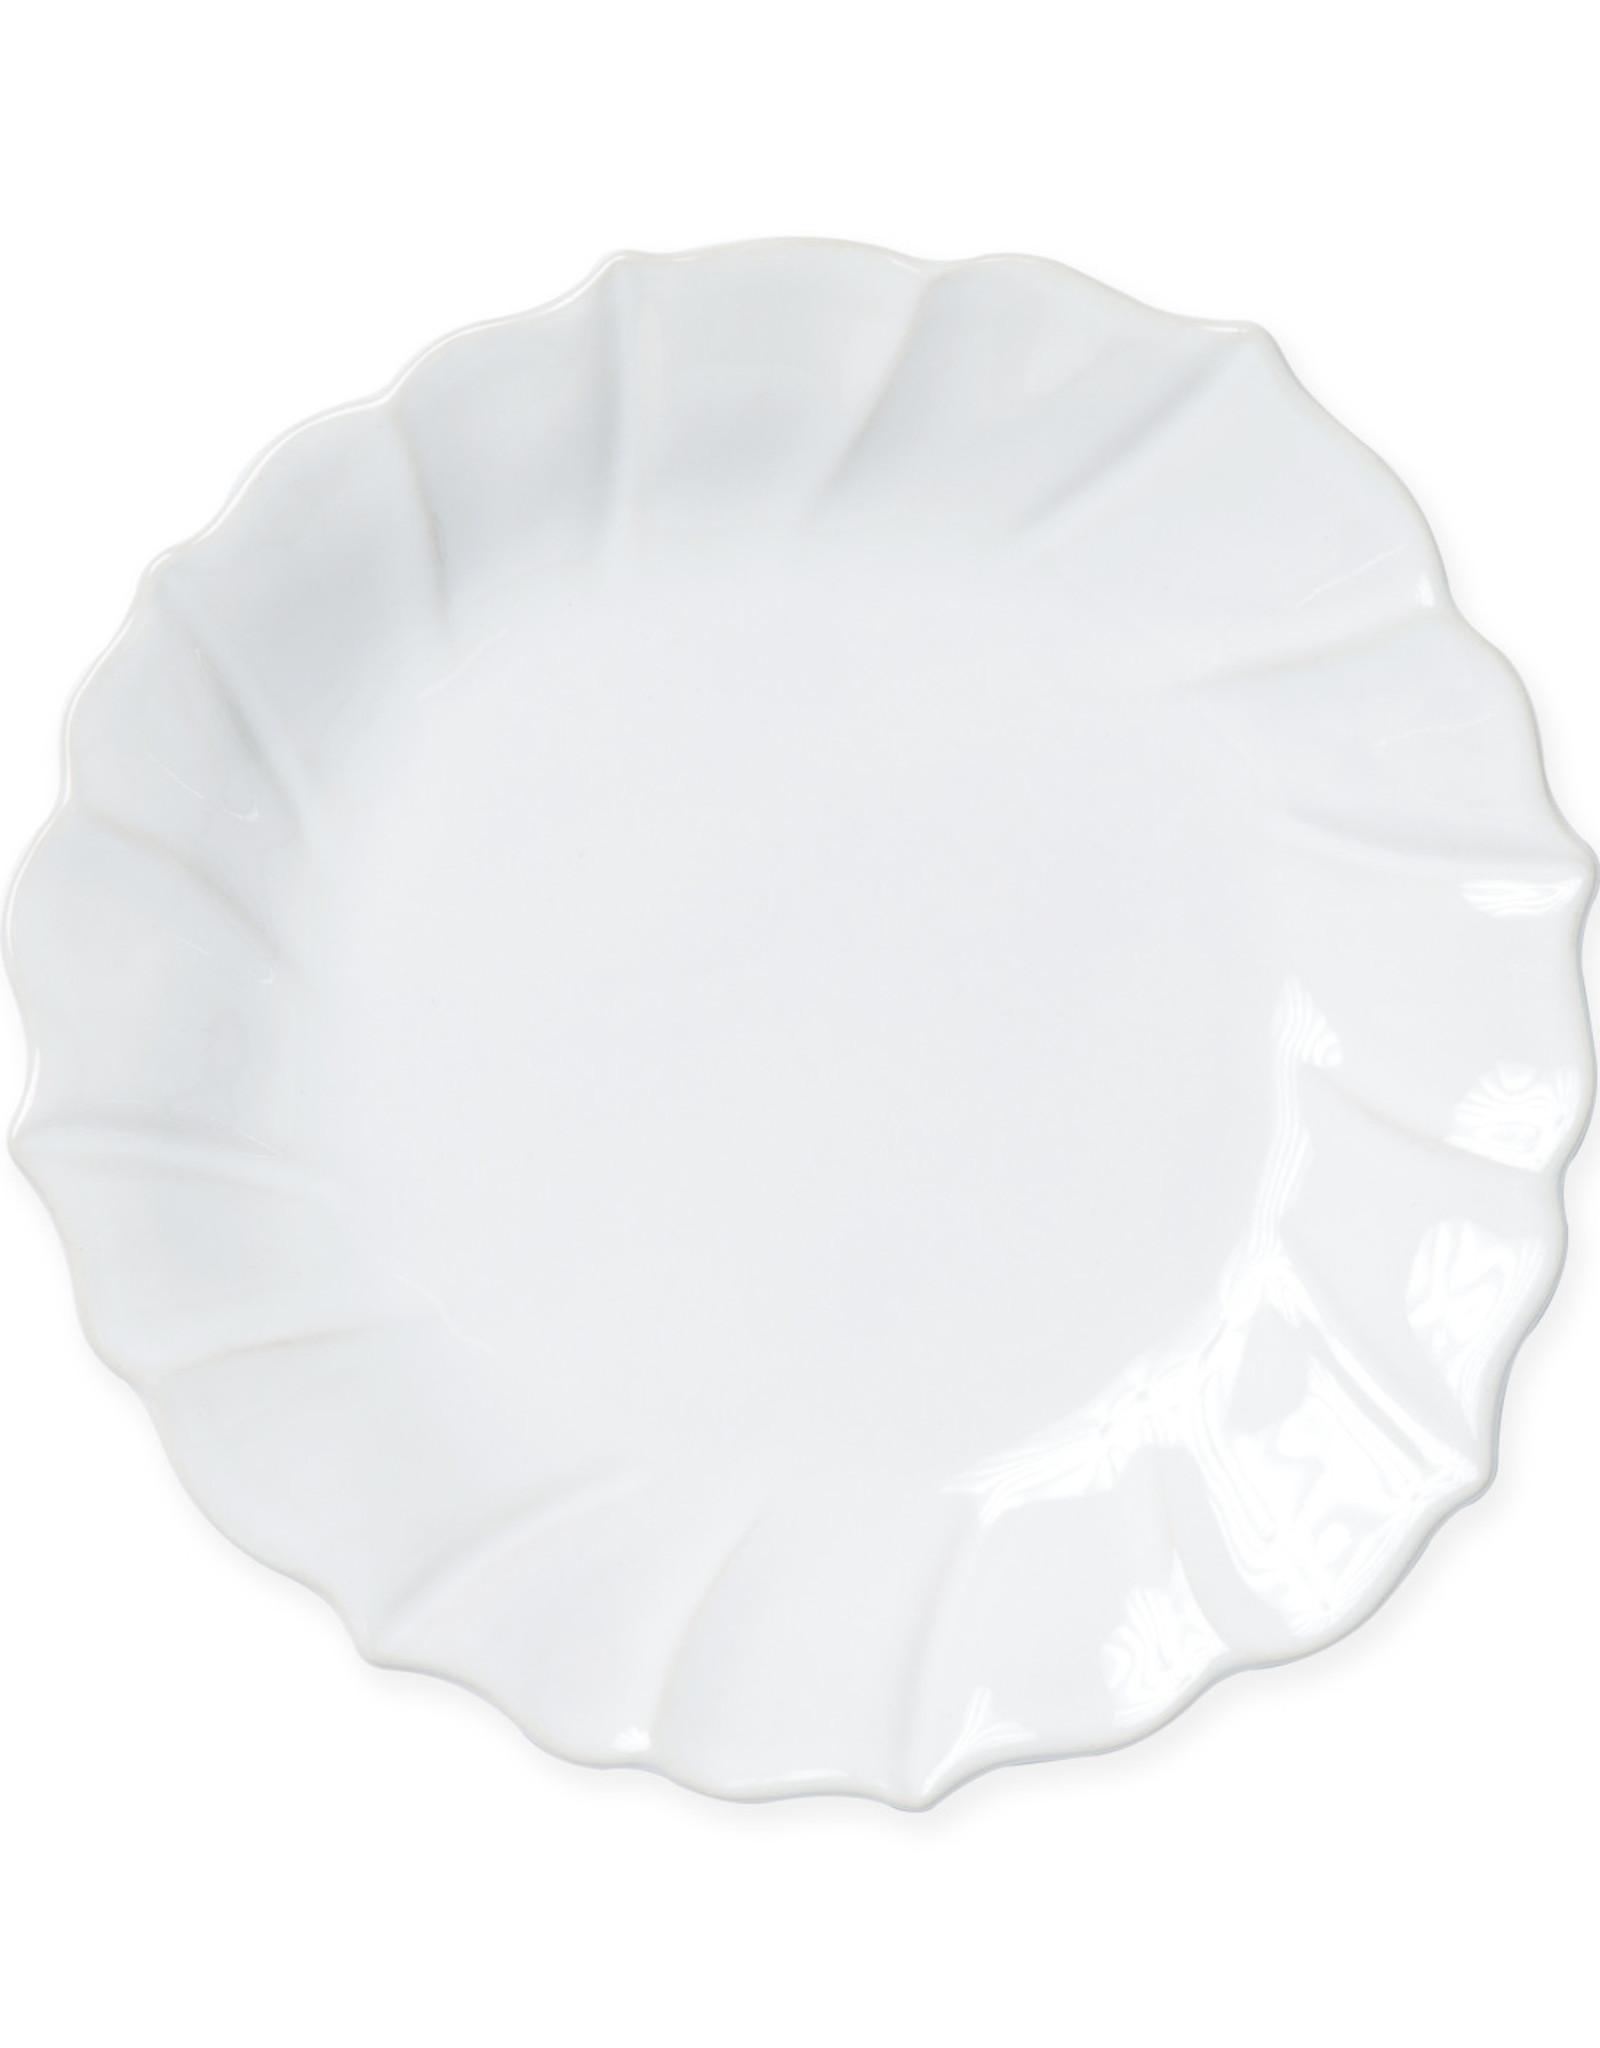 Vietri Incanto Stoneware White Ruffle Salad Plate